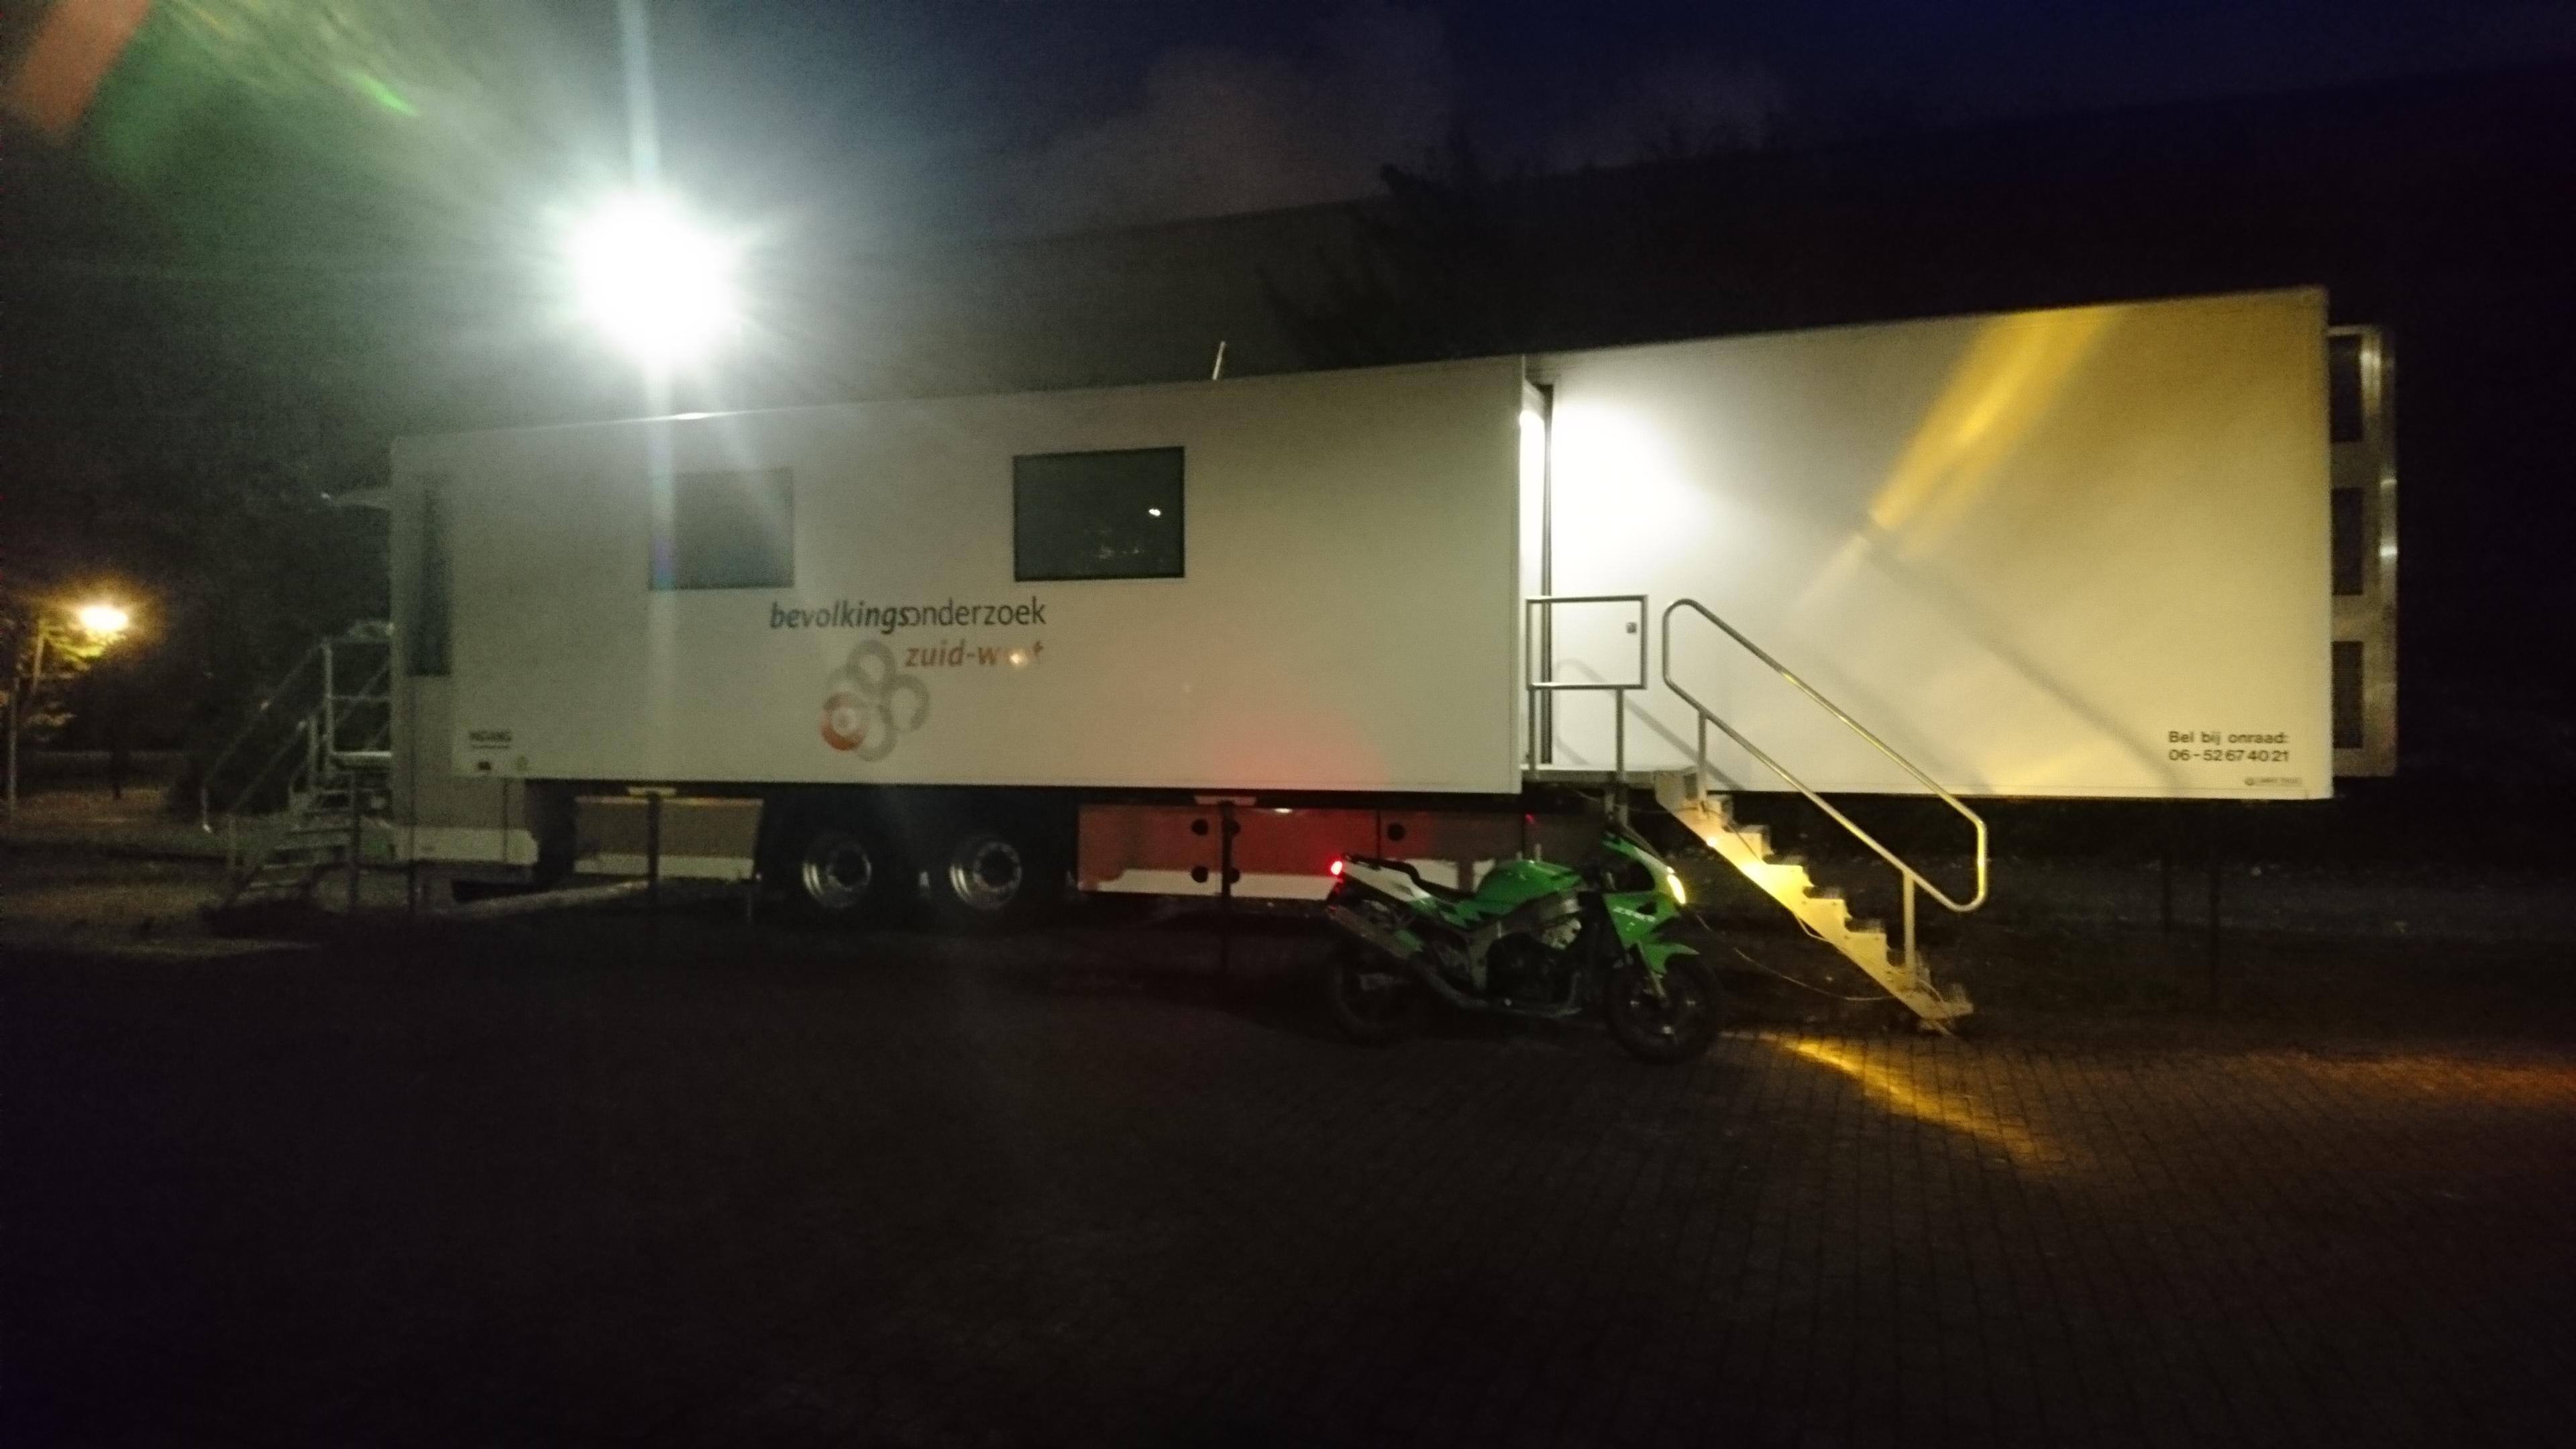 http://piczwart.nl/moto/punten/637.jpg